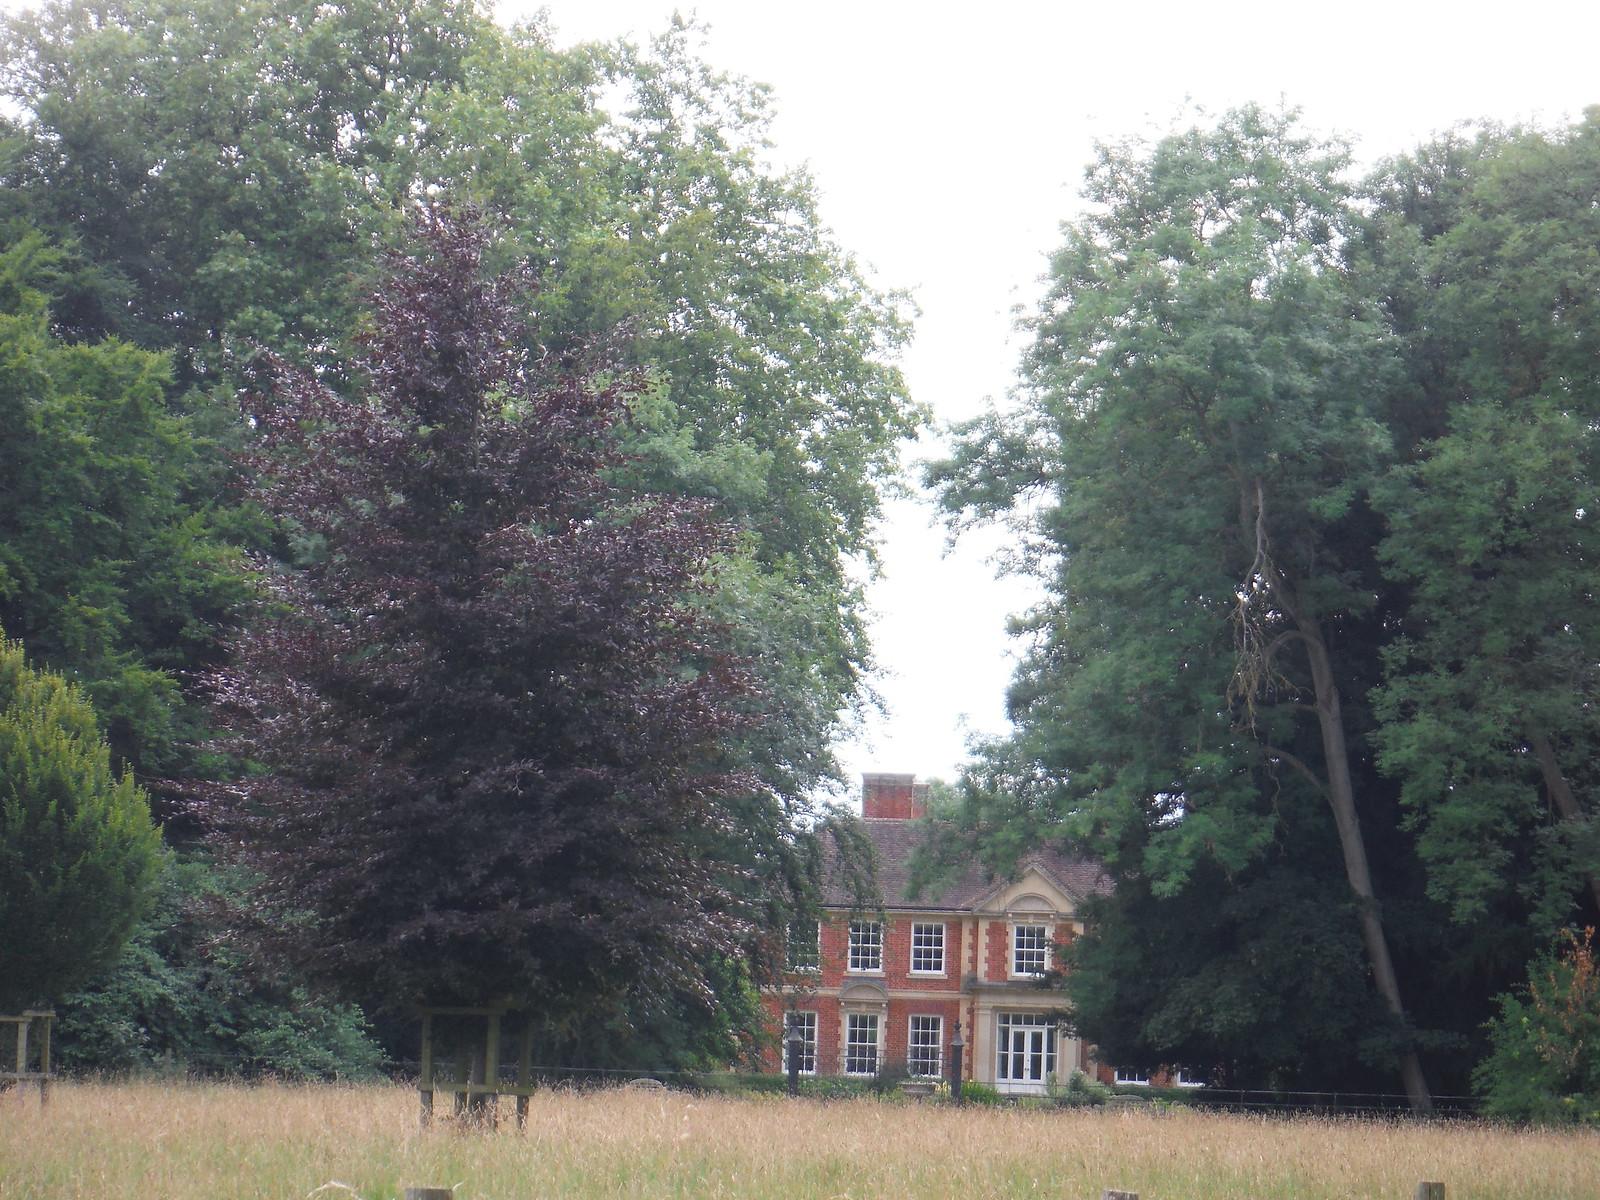 Shillington Manor, Apsley End SWC Walk 233 - Arlesey to Letchworth Garden City